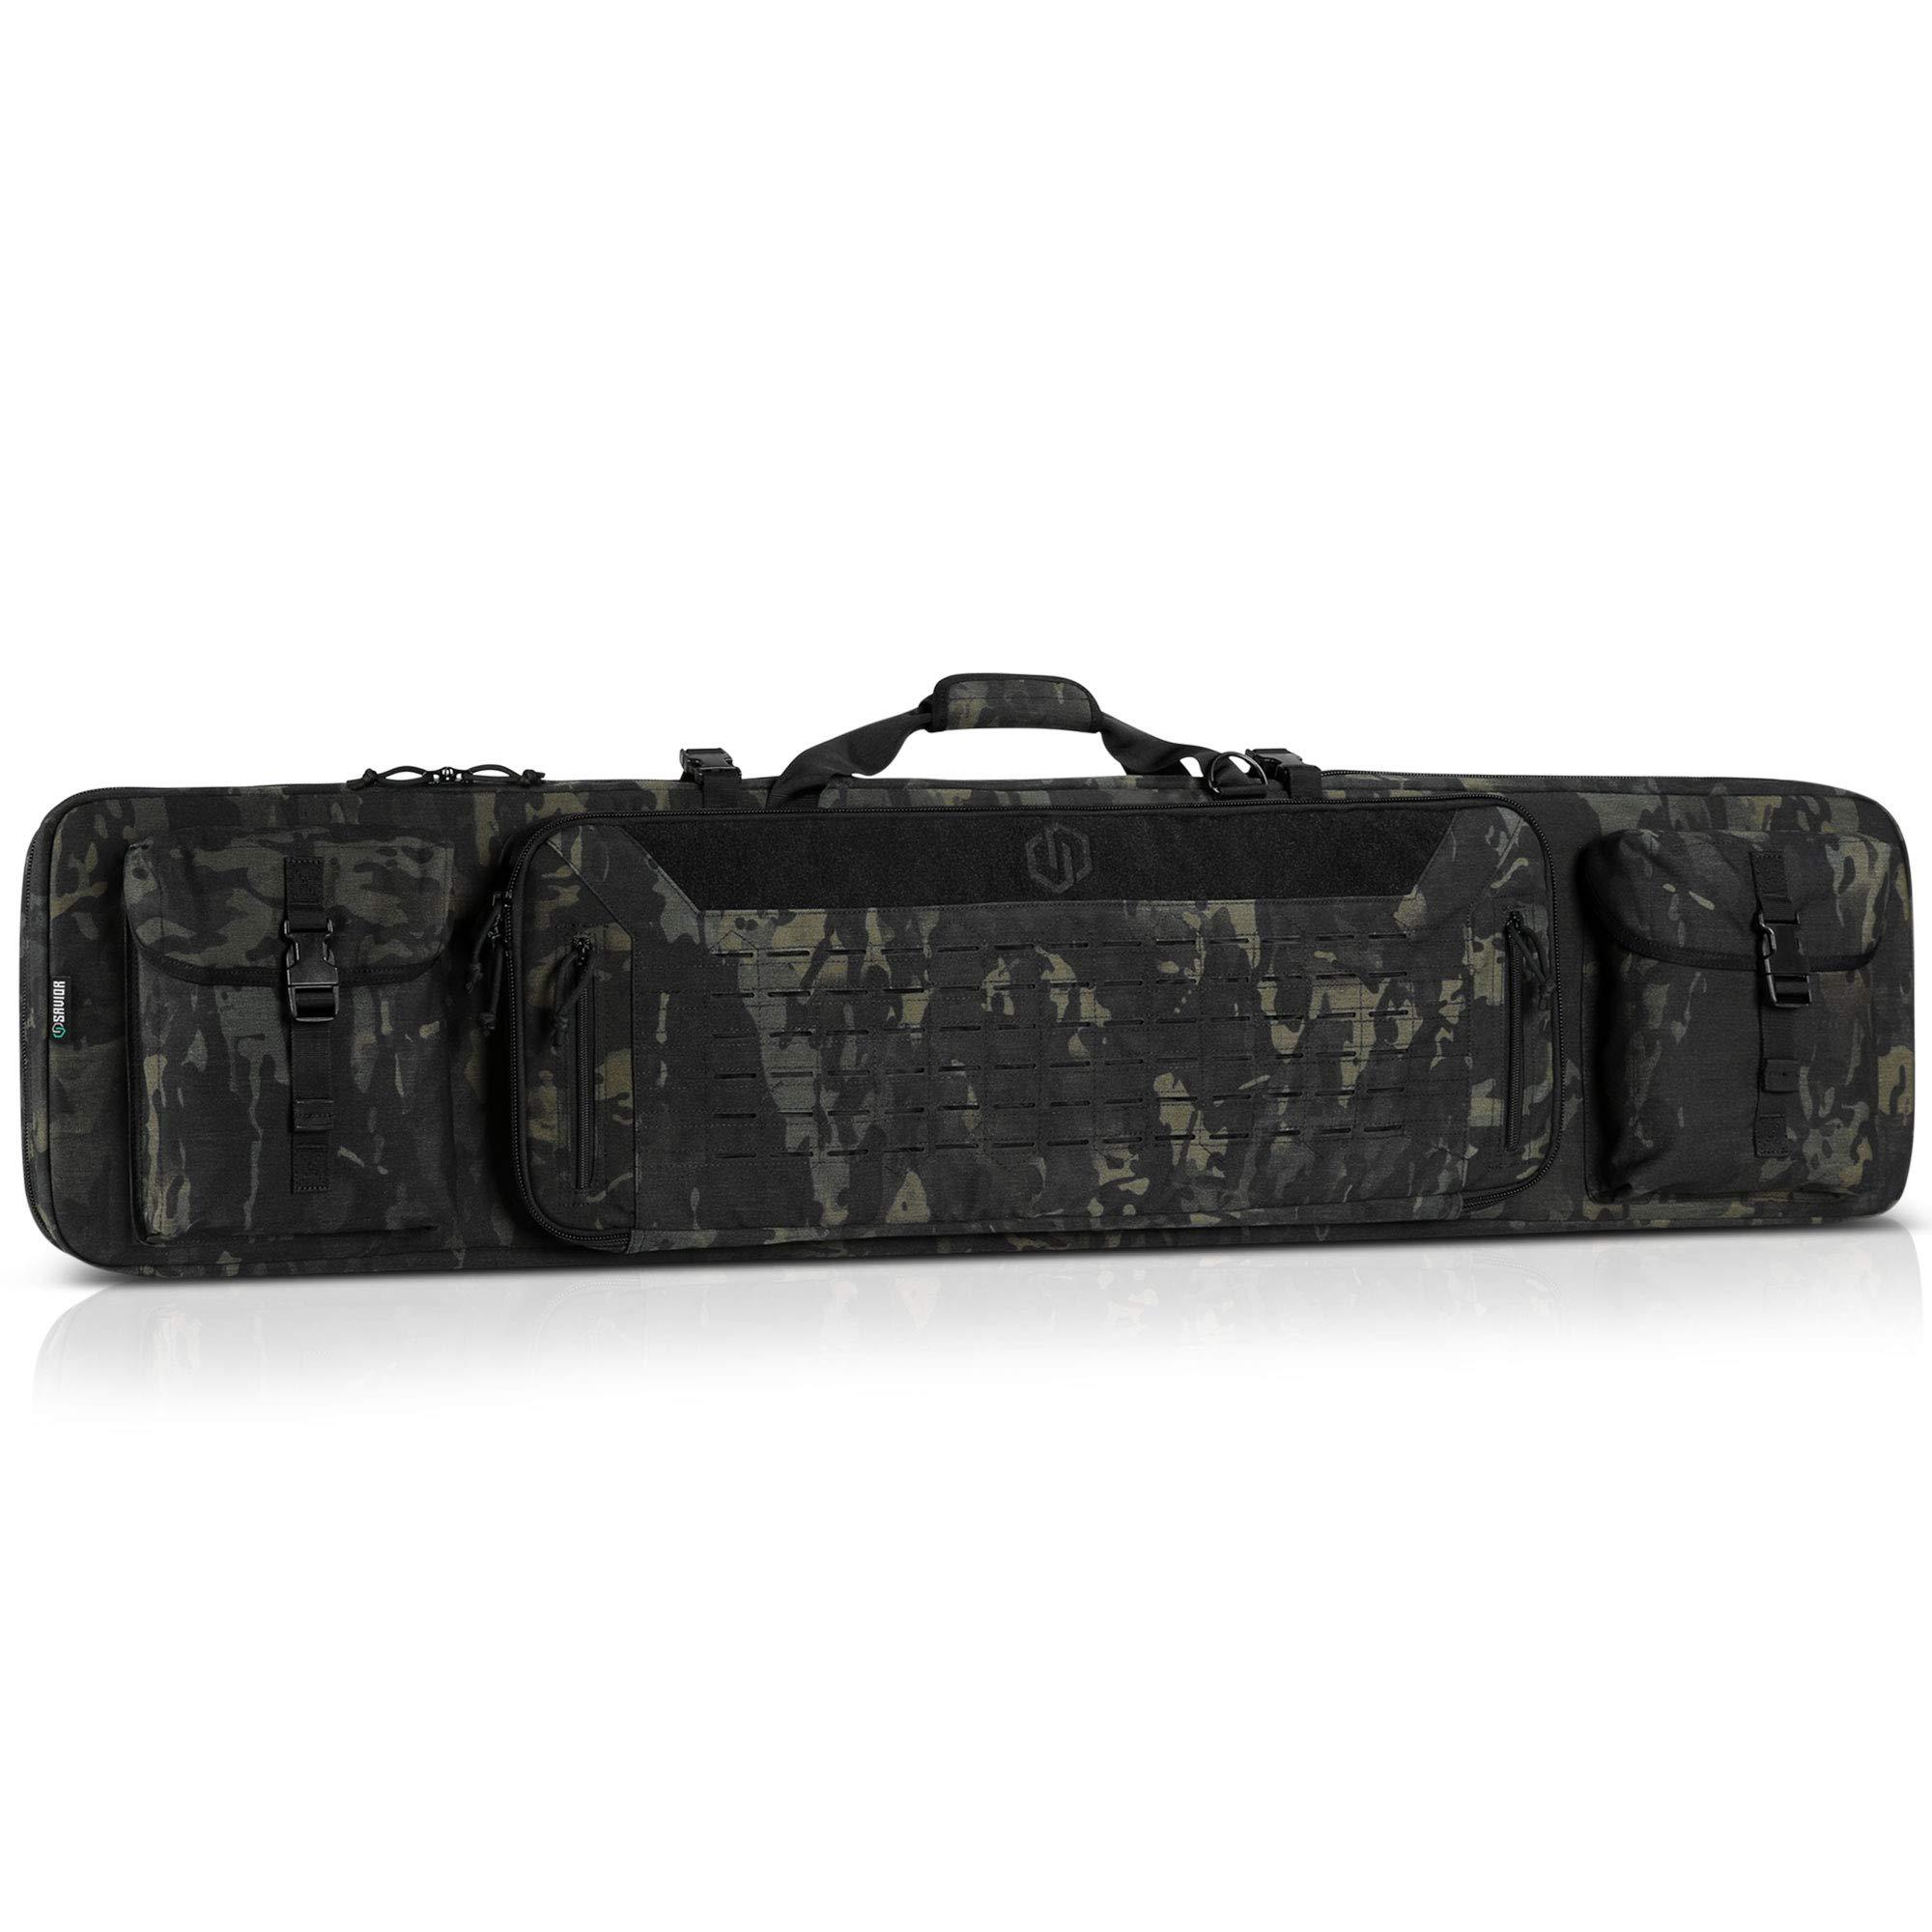 Savior Equipment 55'' Urban Warfare Multicam Black Tactical Double Carbine Long Rifle Bag Firearm Gun Case w/Removable Backpack Strap - 1000D Cordura Nylon Fabric, UTX Buckles, YKK Zippers by Savior Equipment